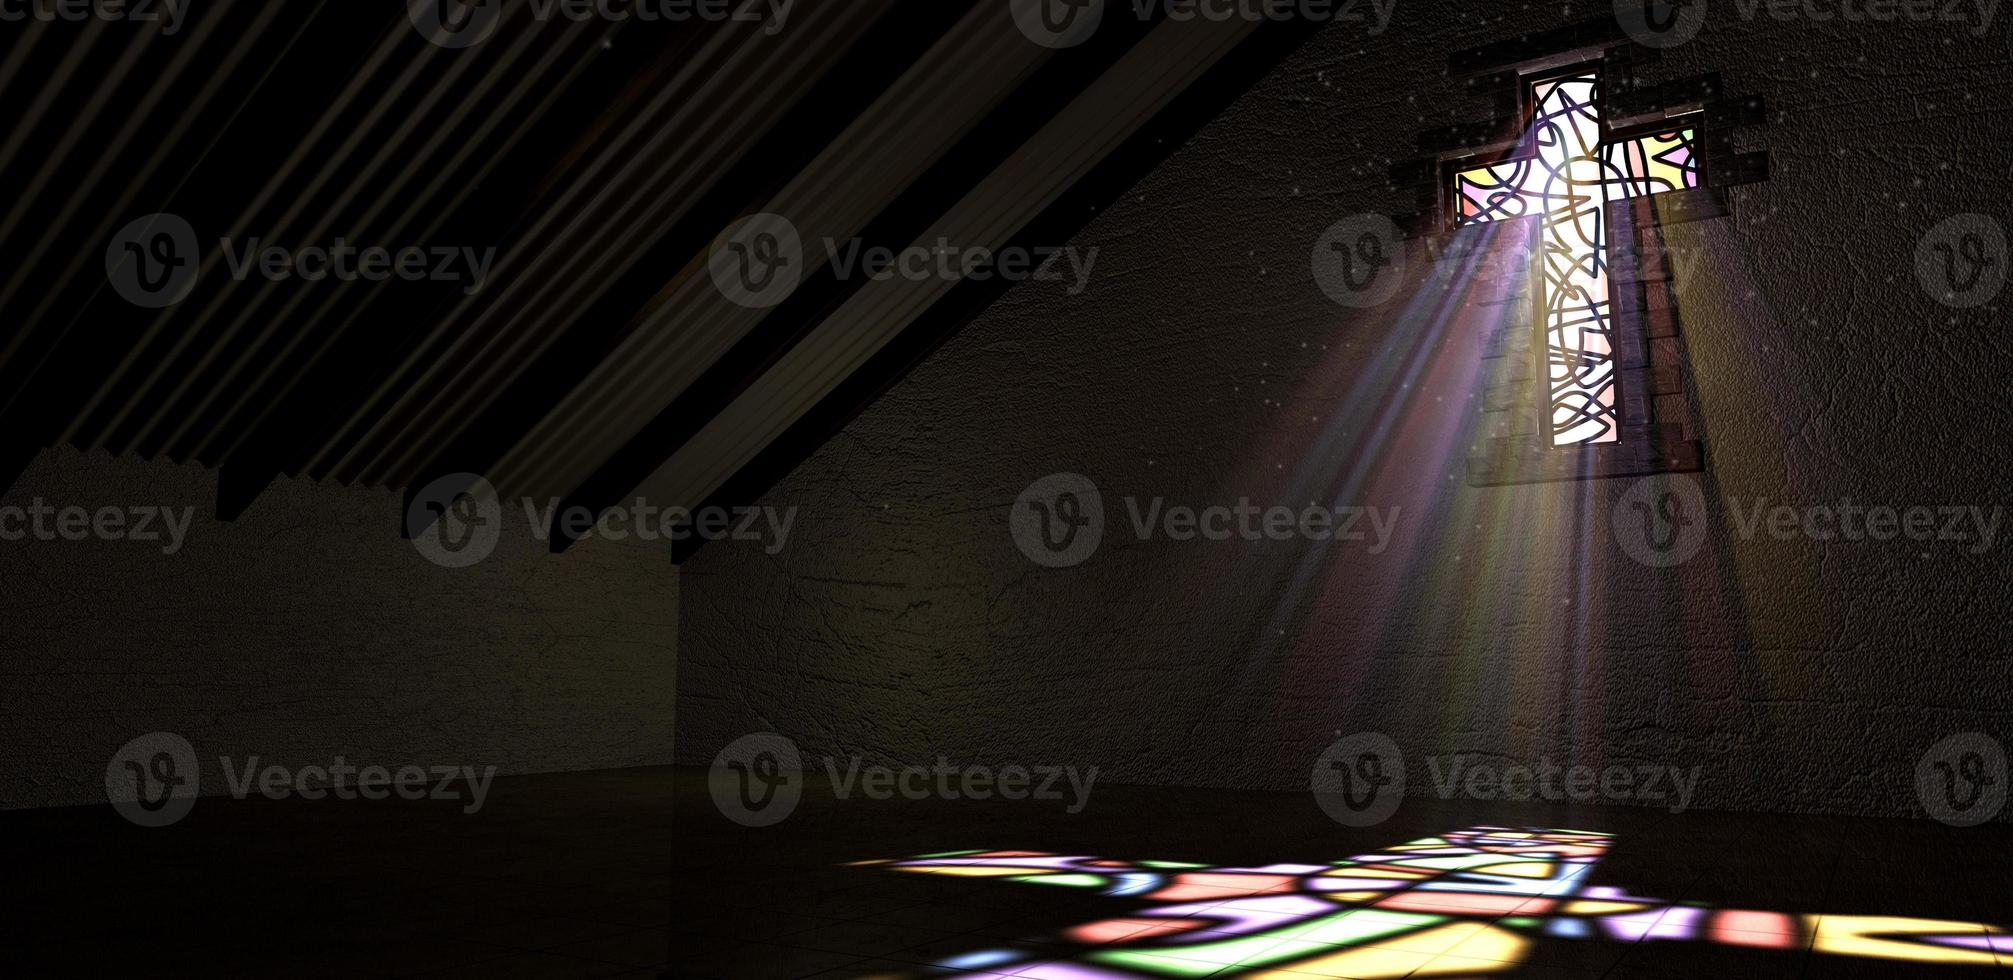 glasraam kruisbeeld lichtstraal kleur foto